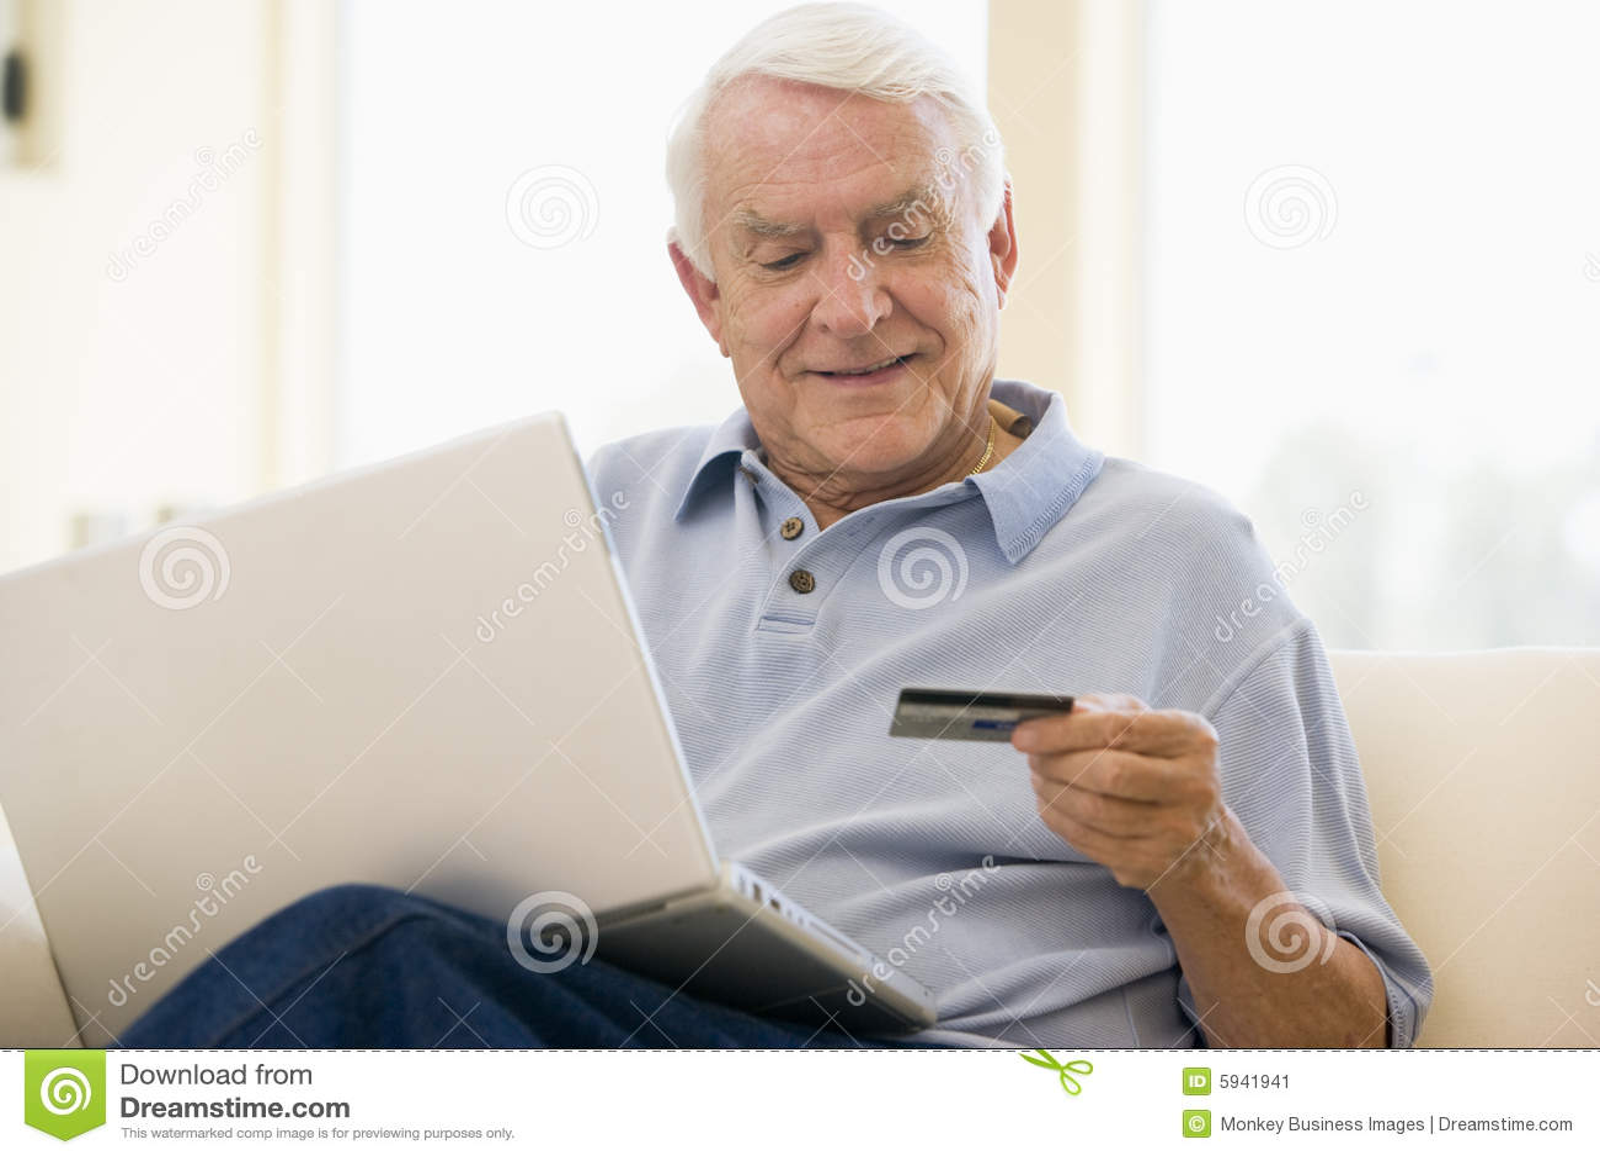 займы пенсионерам до 80 без отказа